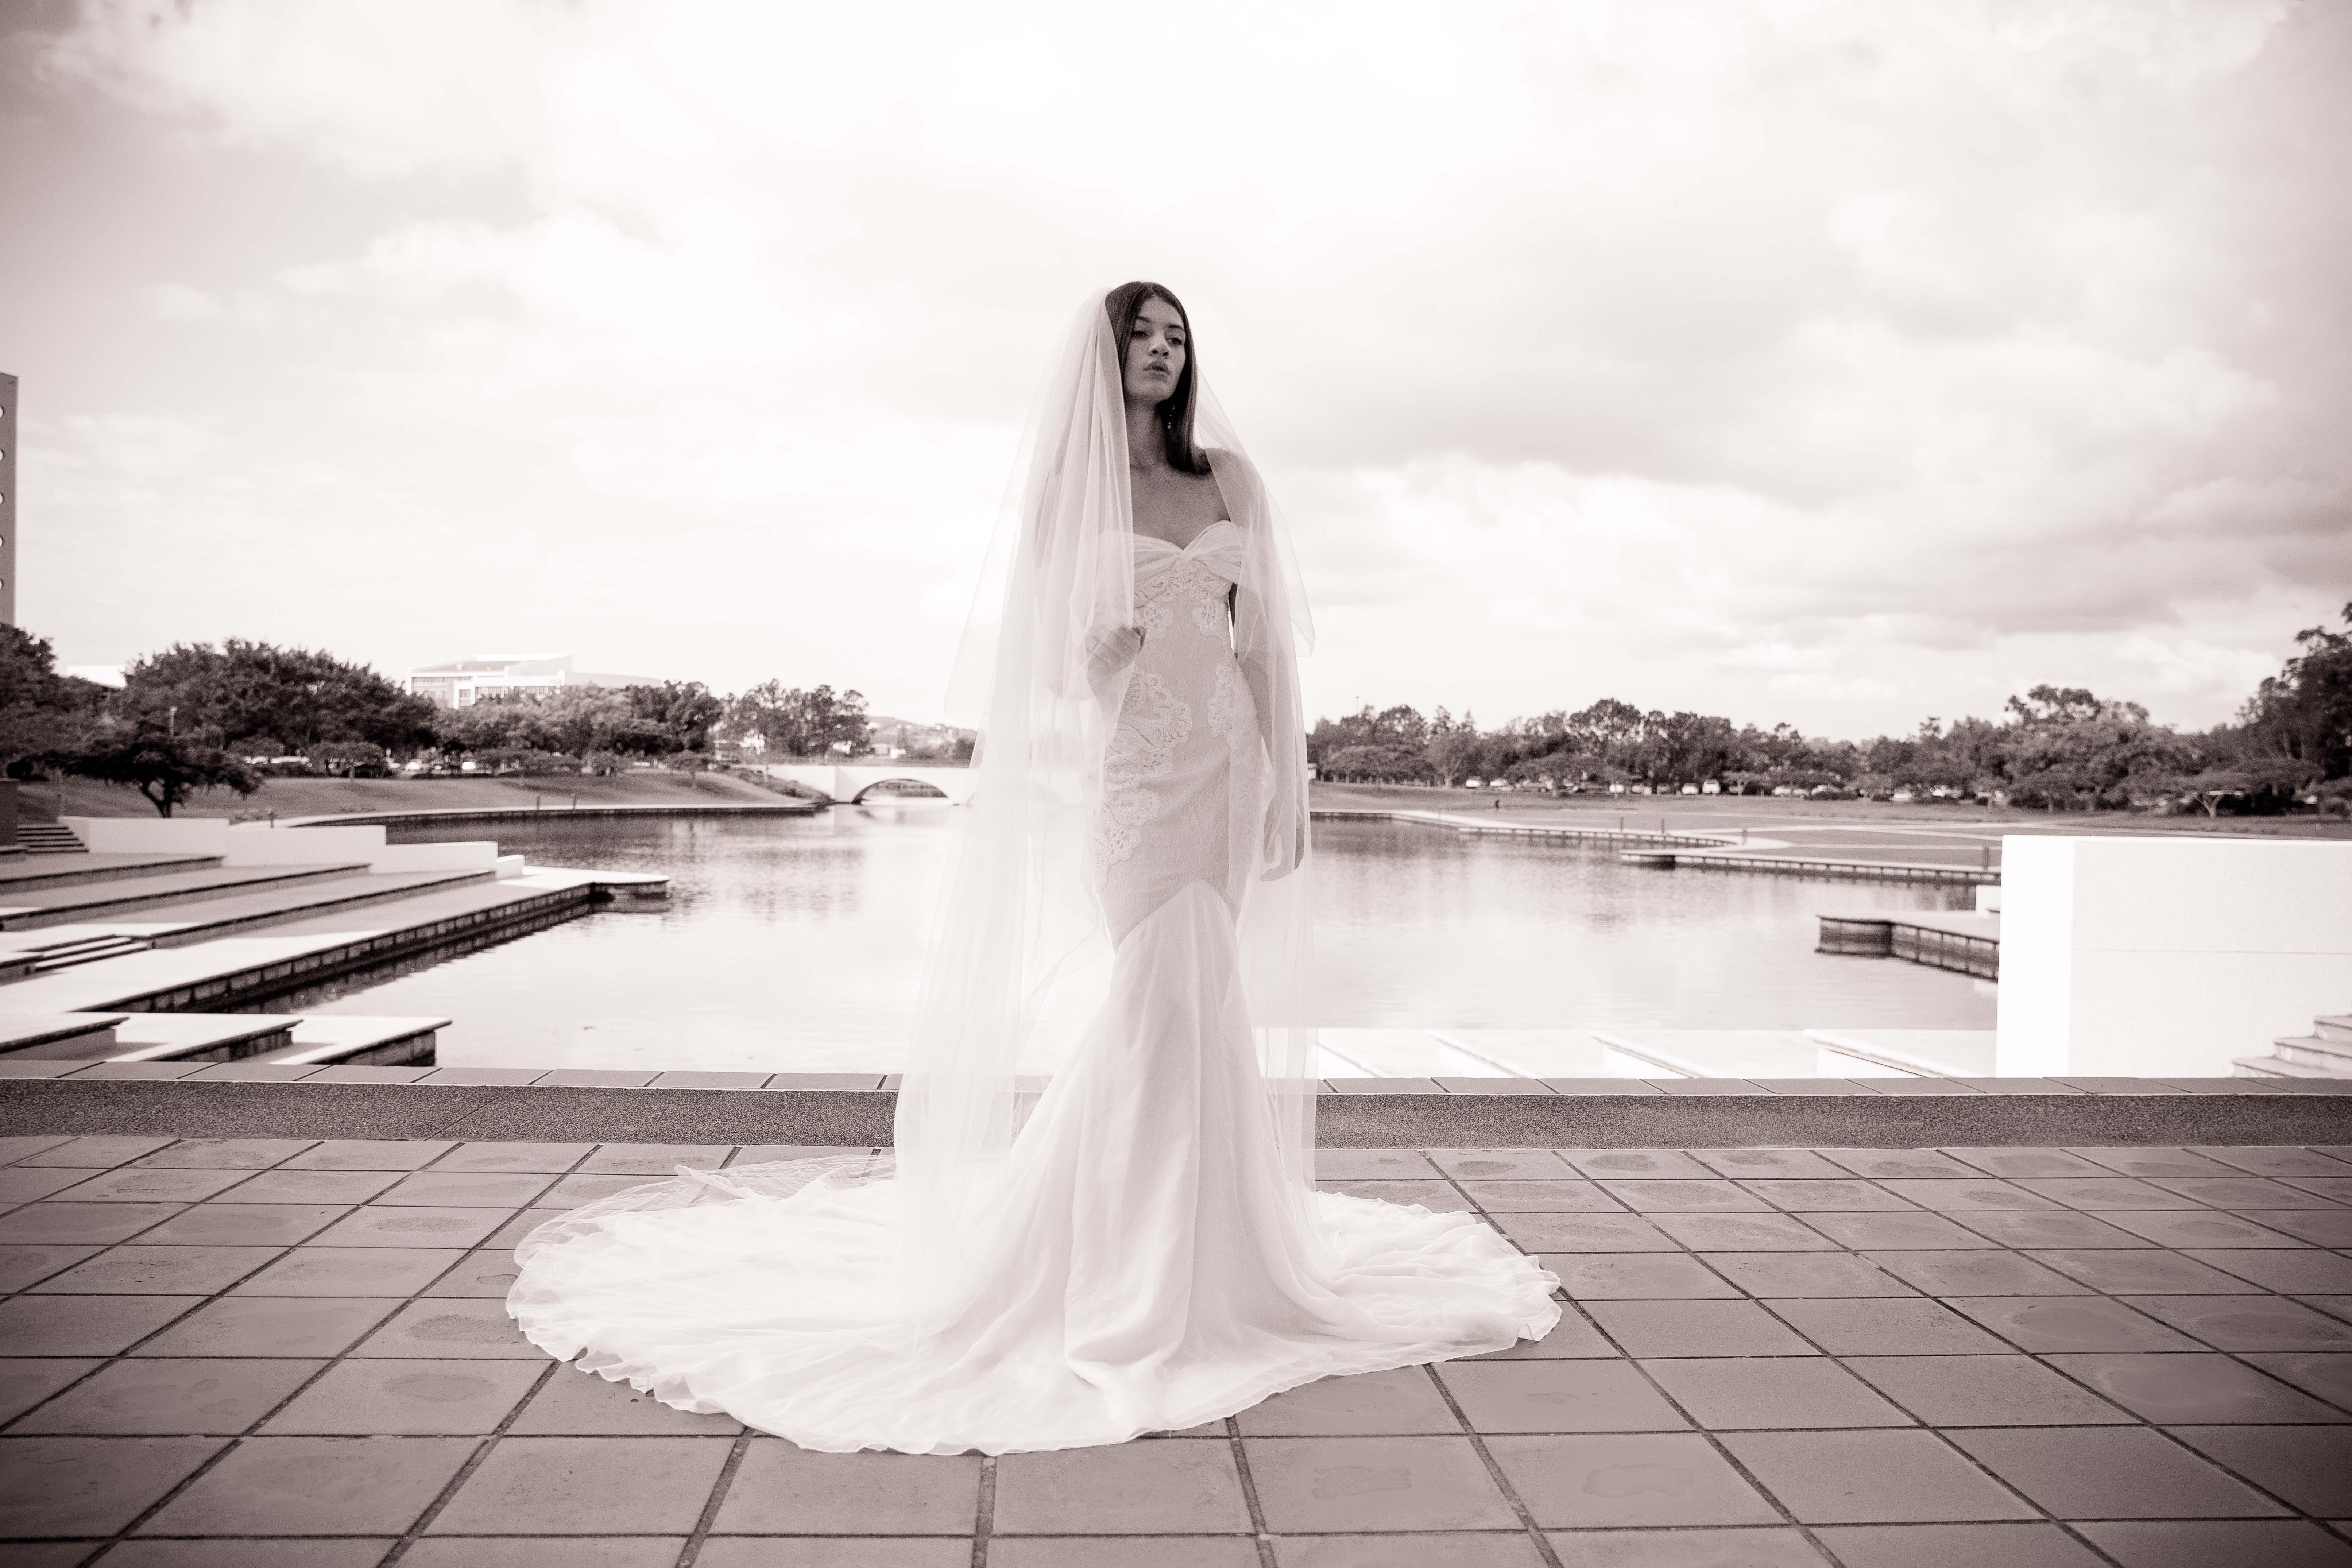 Model, Wedding gown, wedding dress, Fiona K Photography, Wedding, Bride, Groom, Wedding Photo inspiration